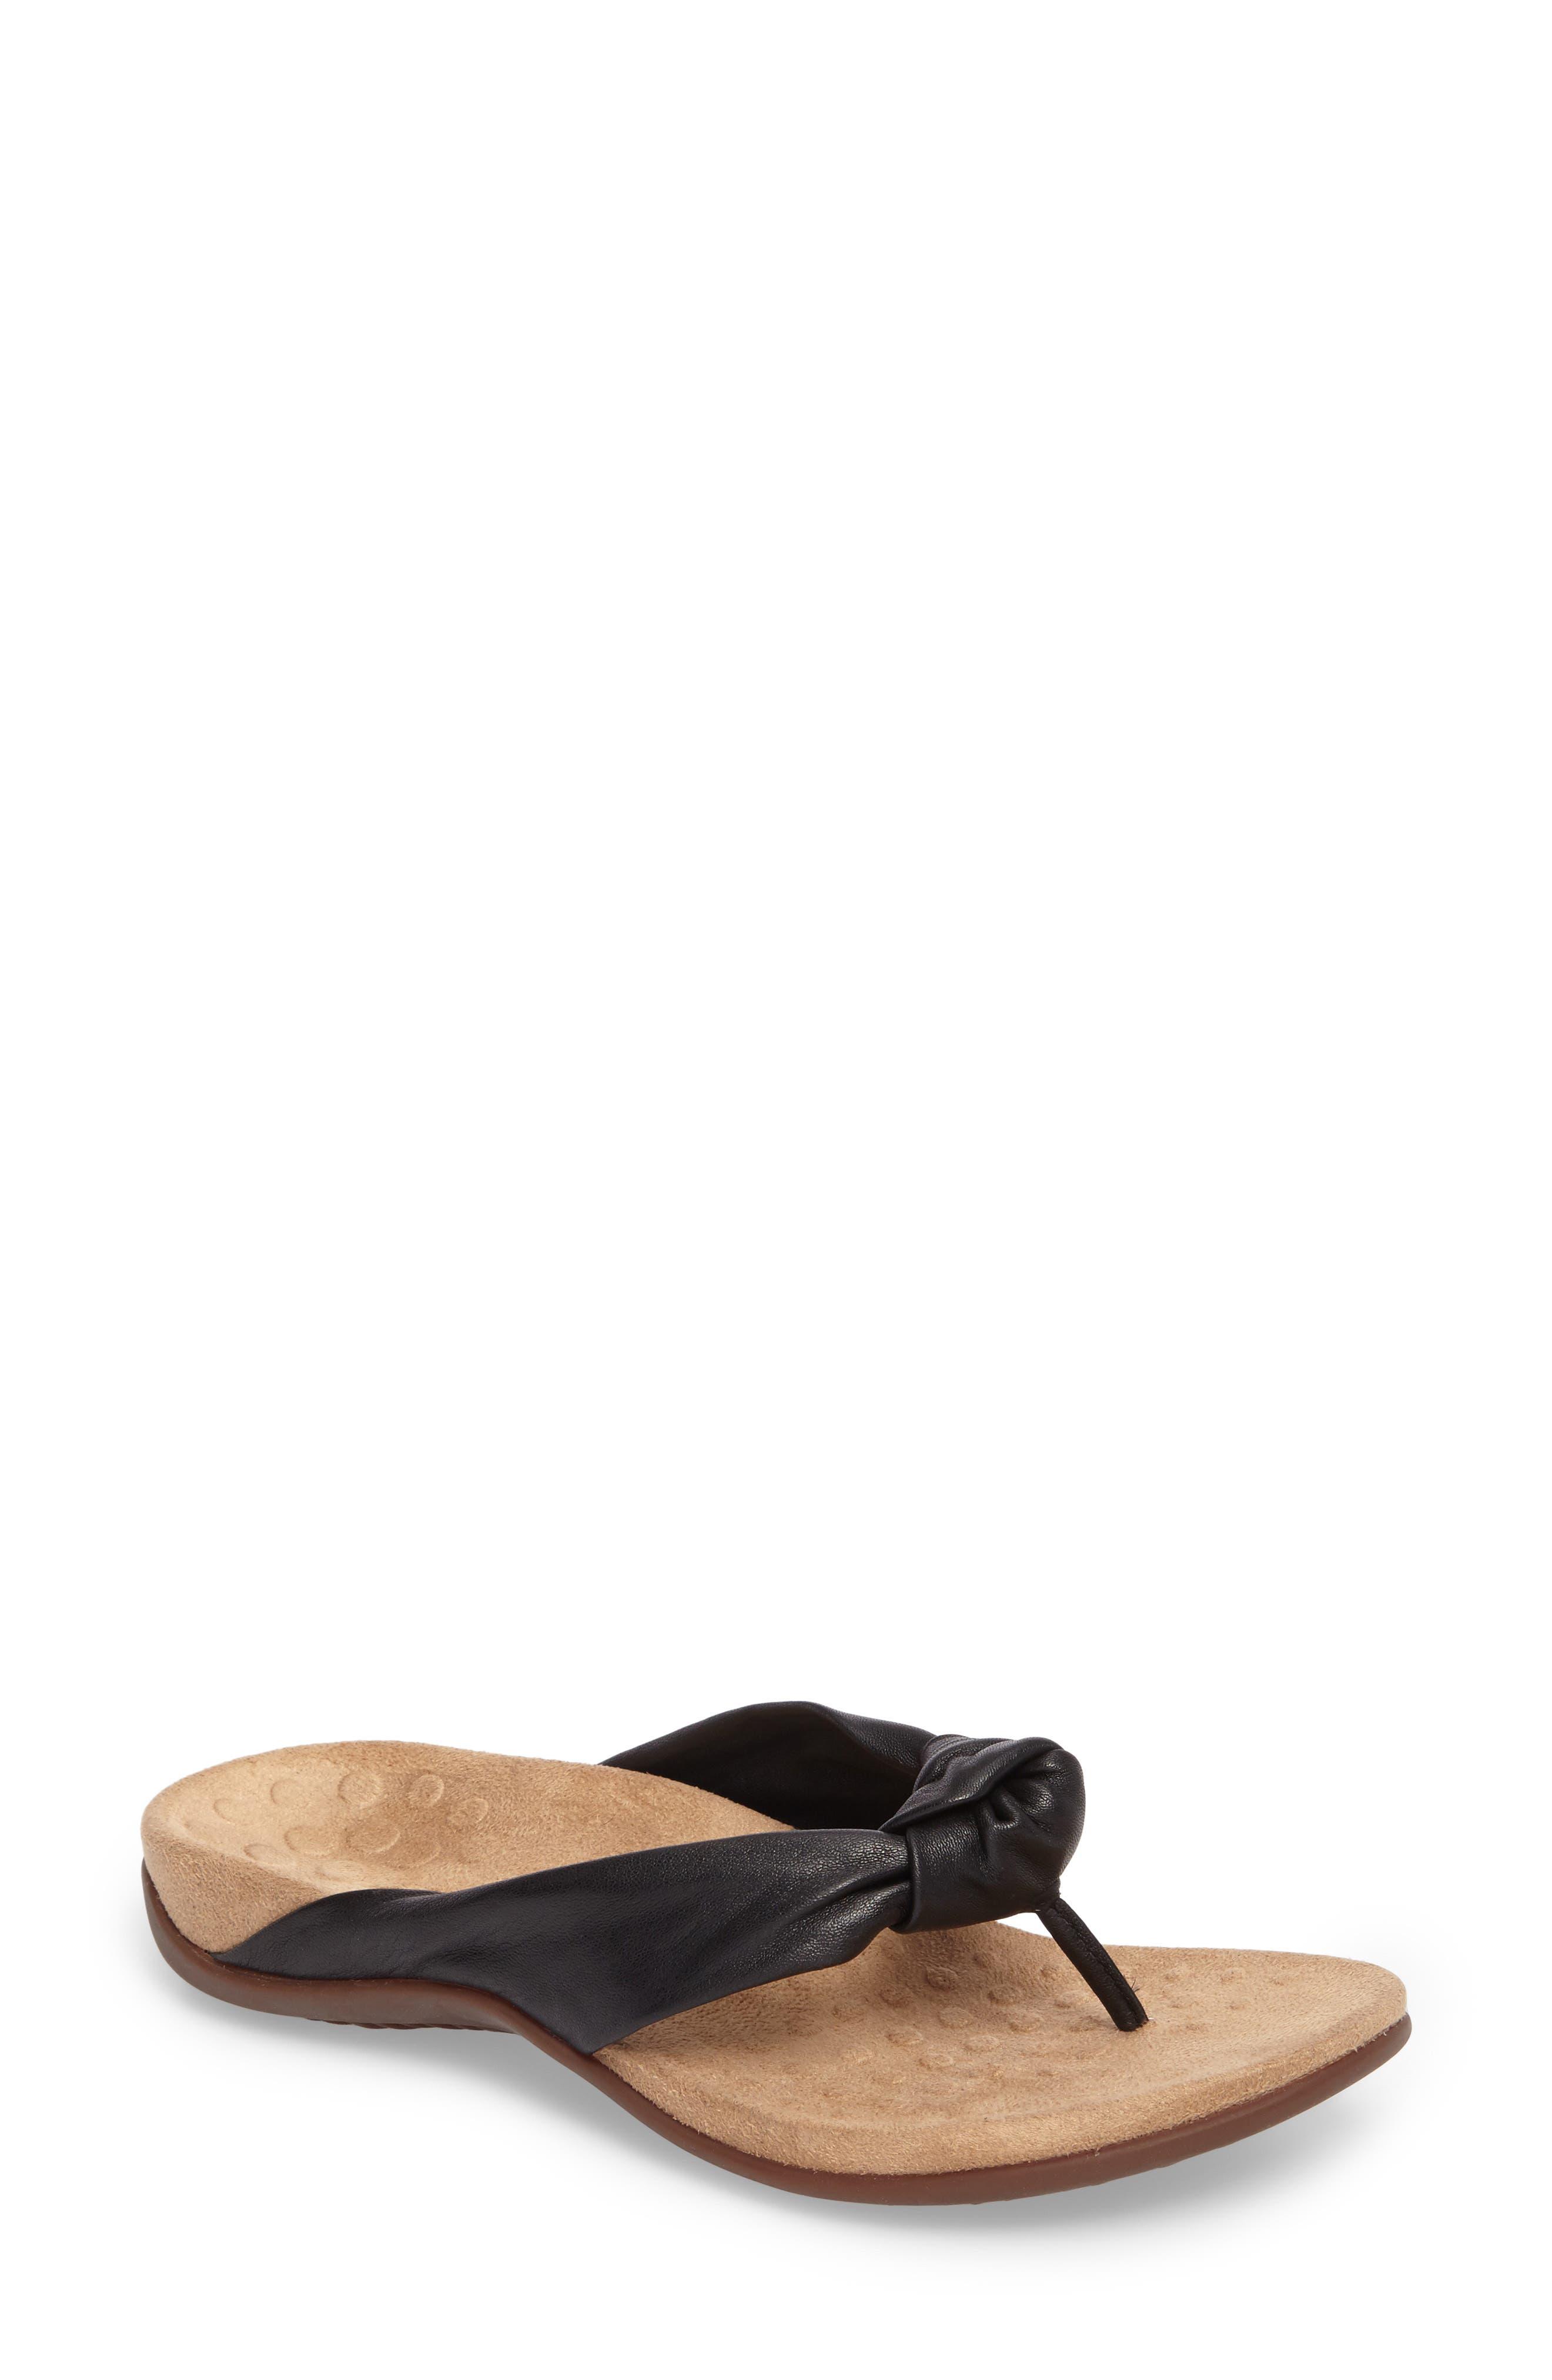 Pippa Flip Flop,                             Main thumbnail 1, color,                             Black Leather